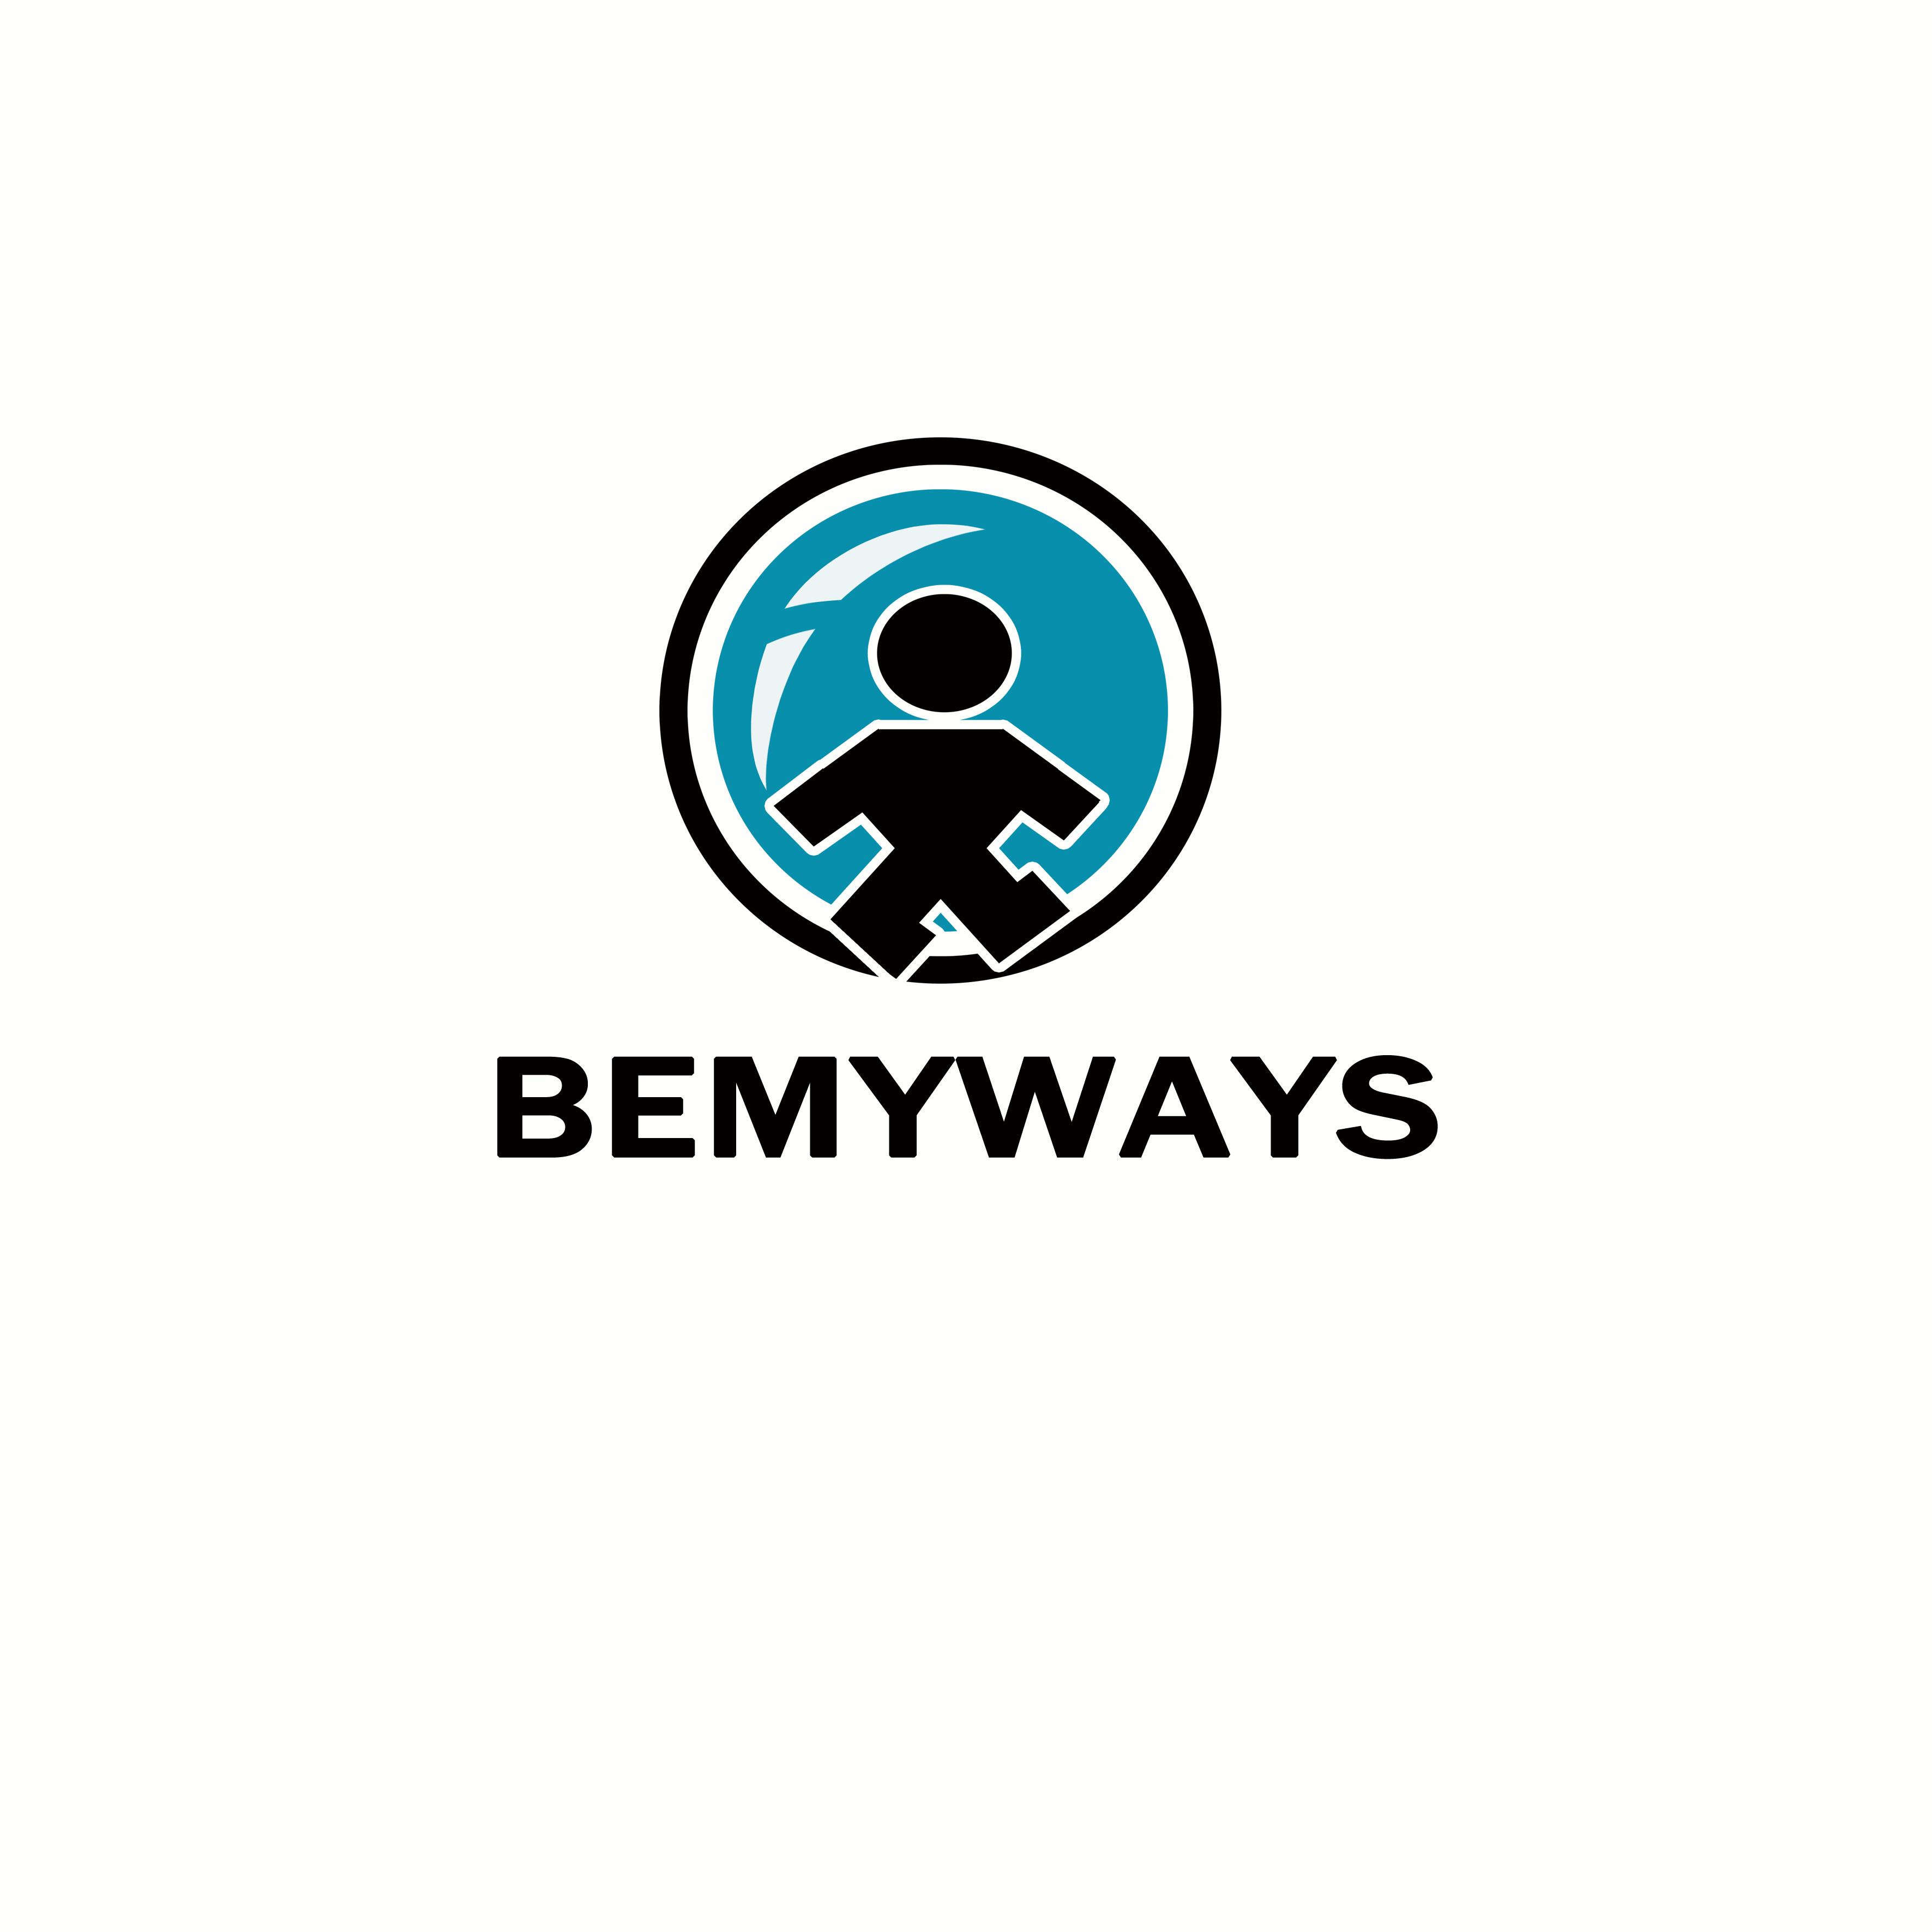 Разработка логотипа и иконки для Travel Video Platform фото f_3955c37299f783aa.jpg